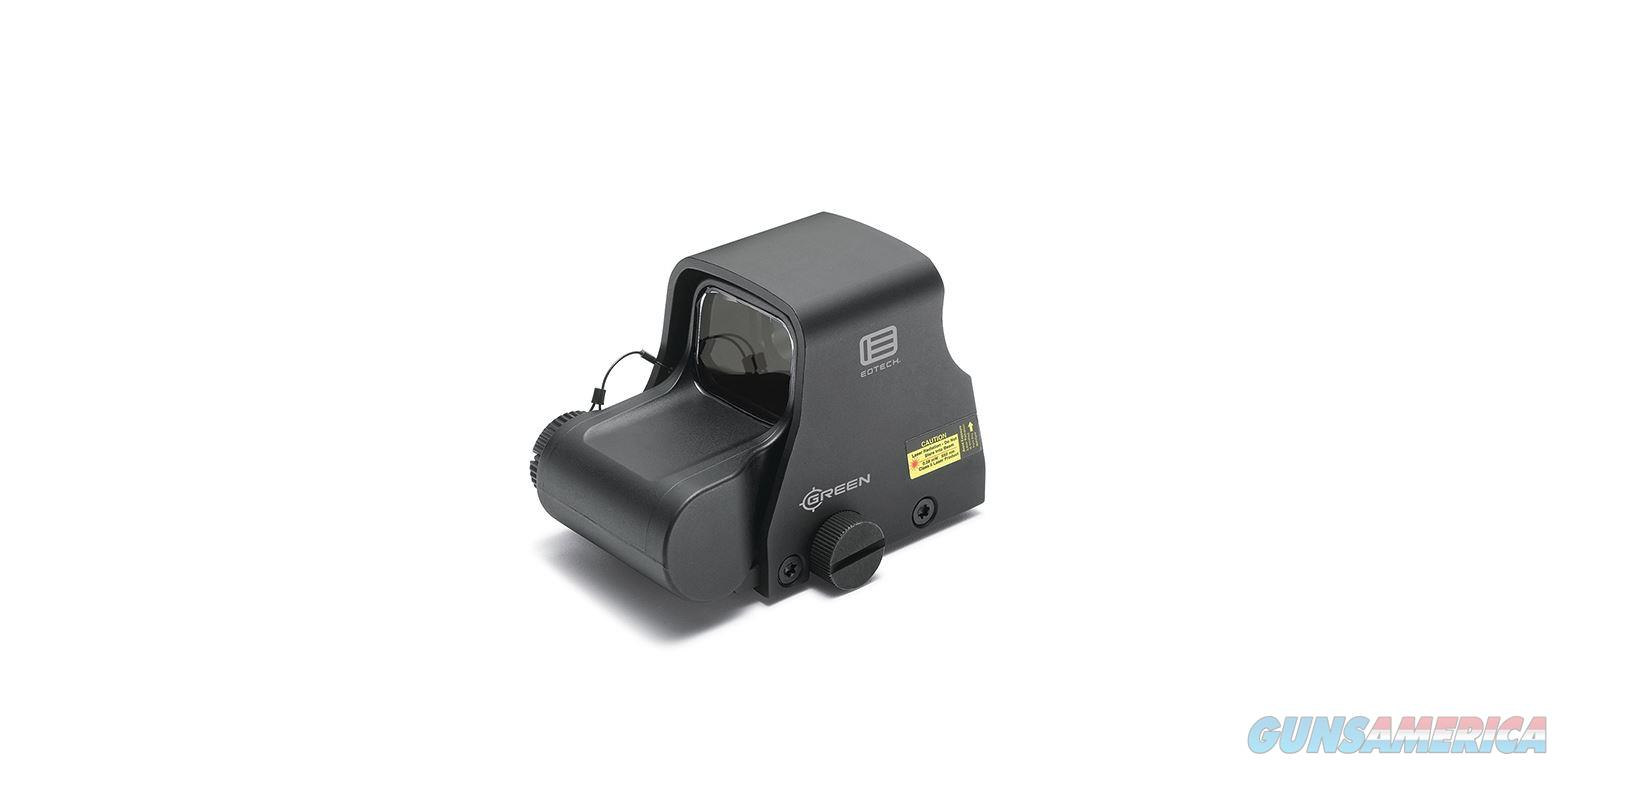 Eotech Xps 2-0 Green XPS20GRN  Non-Guns > Scopes/Mounts/Rings & Optics > Mounts > Other